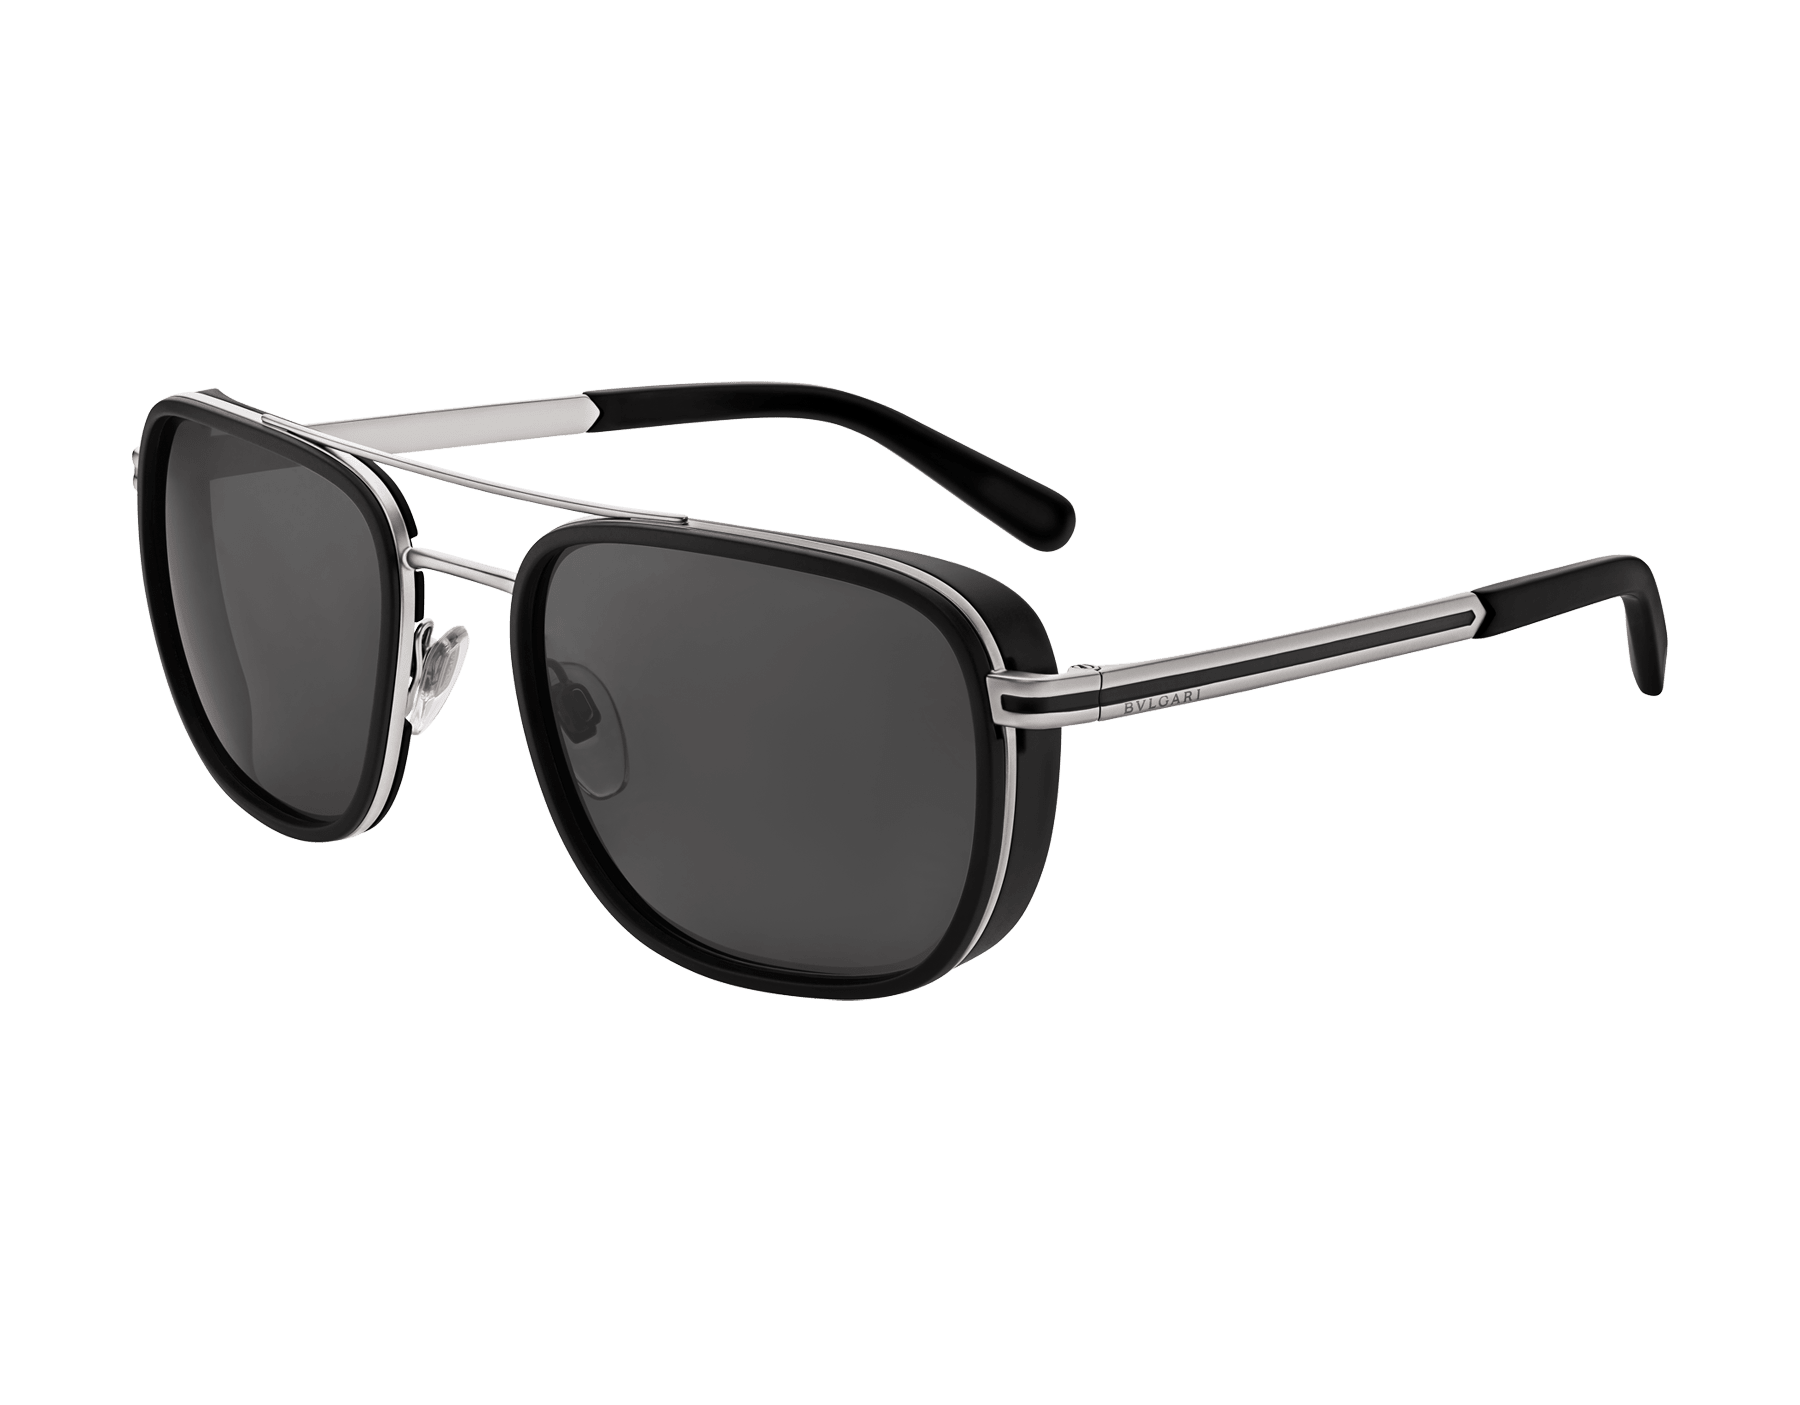 Óculos de sol Bvlgari Bvlgari formato retangular com ponte dupla em metal. 904082 image 1